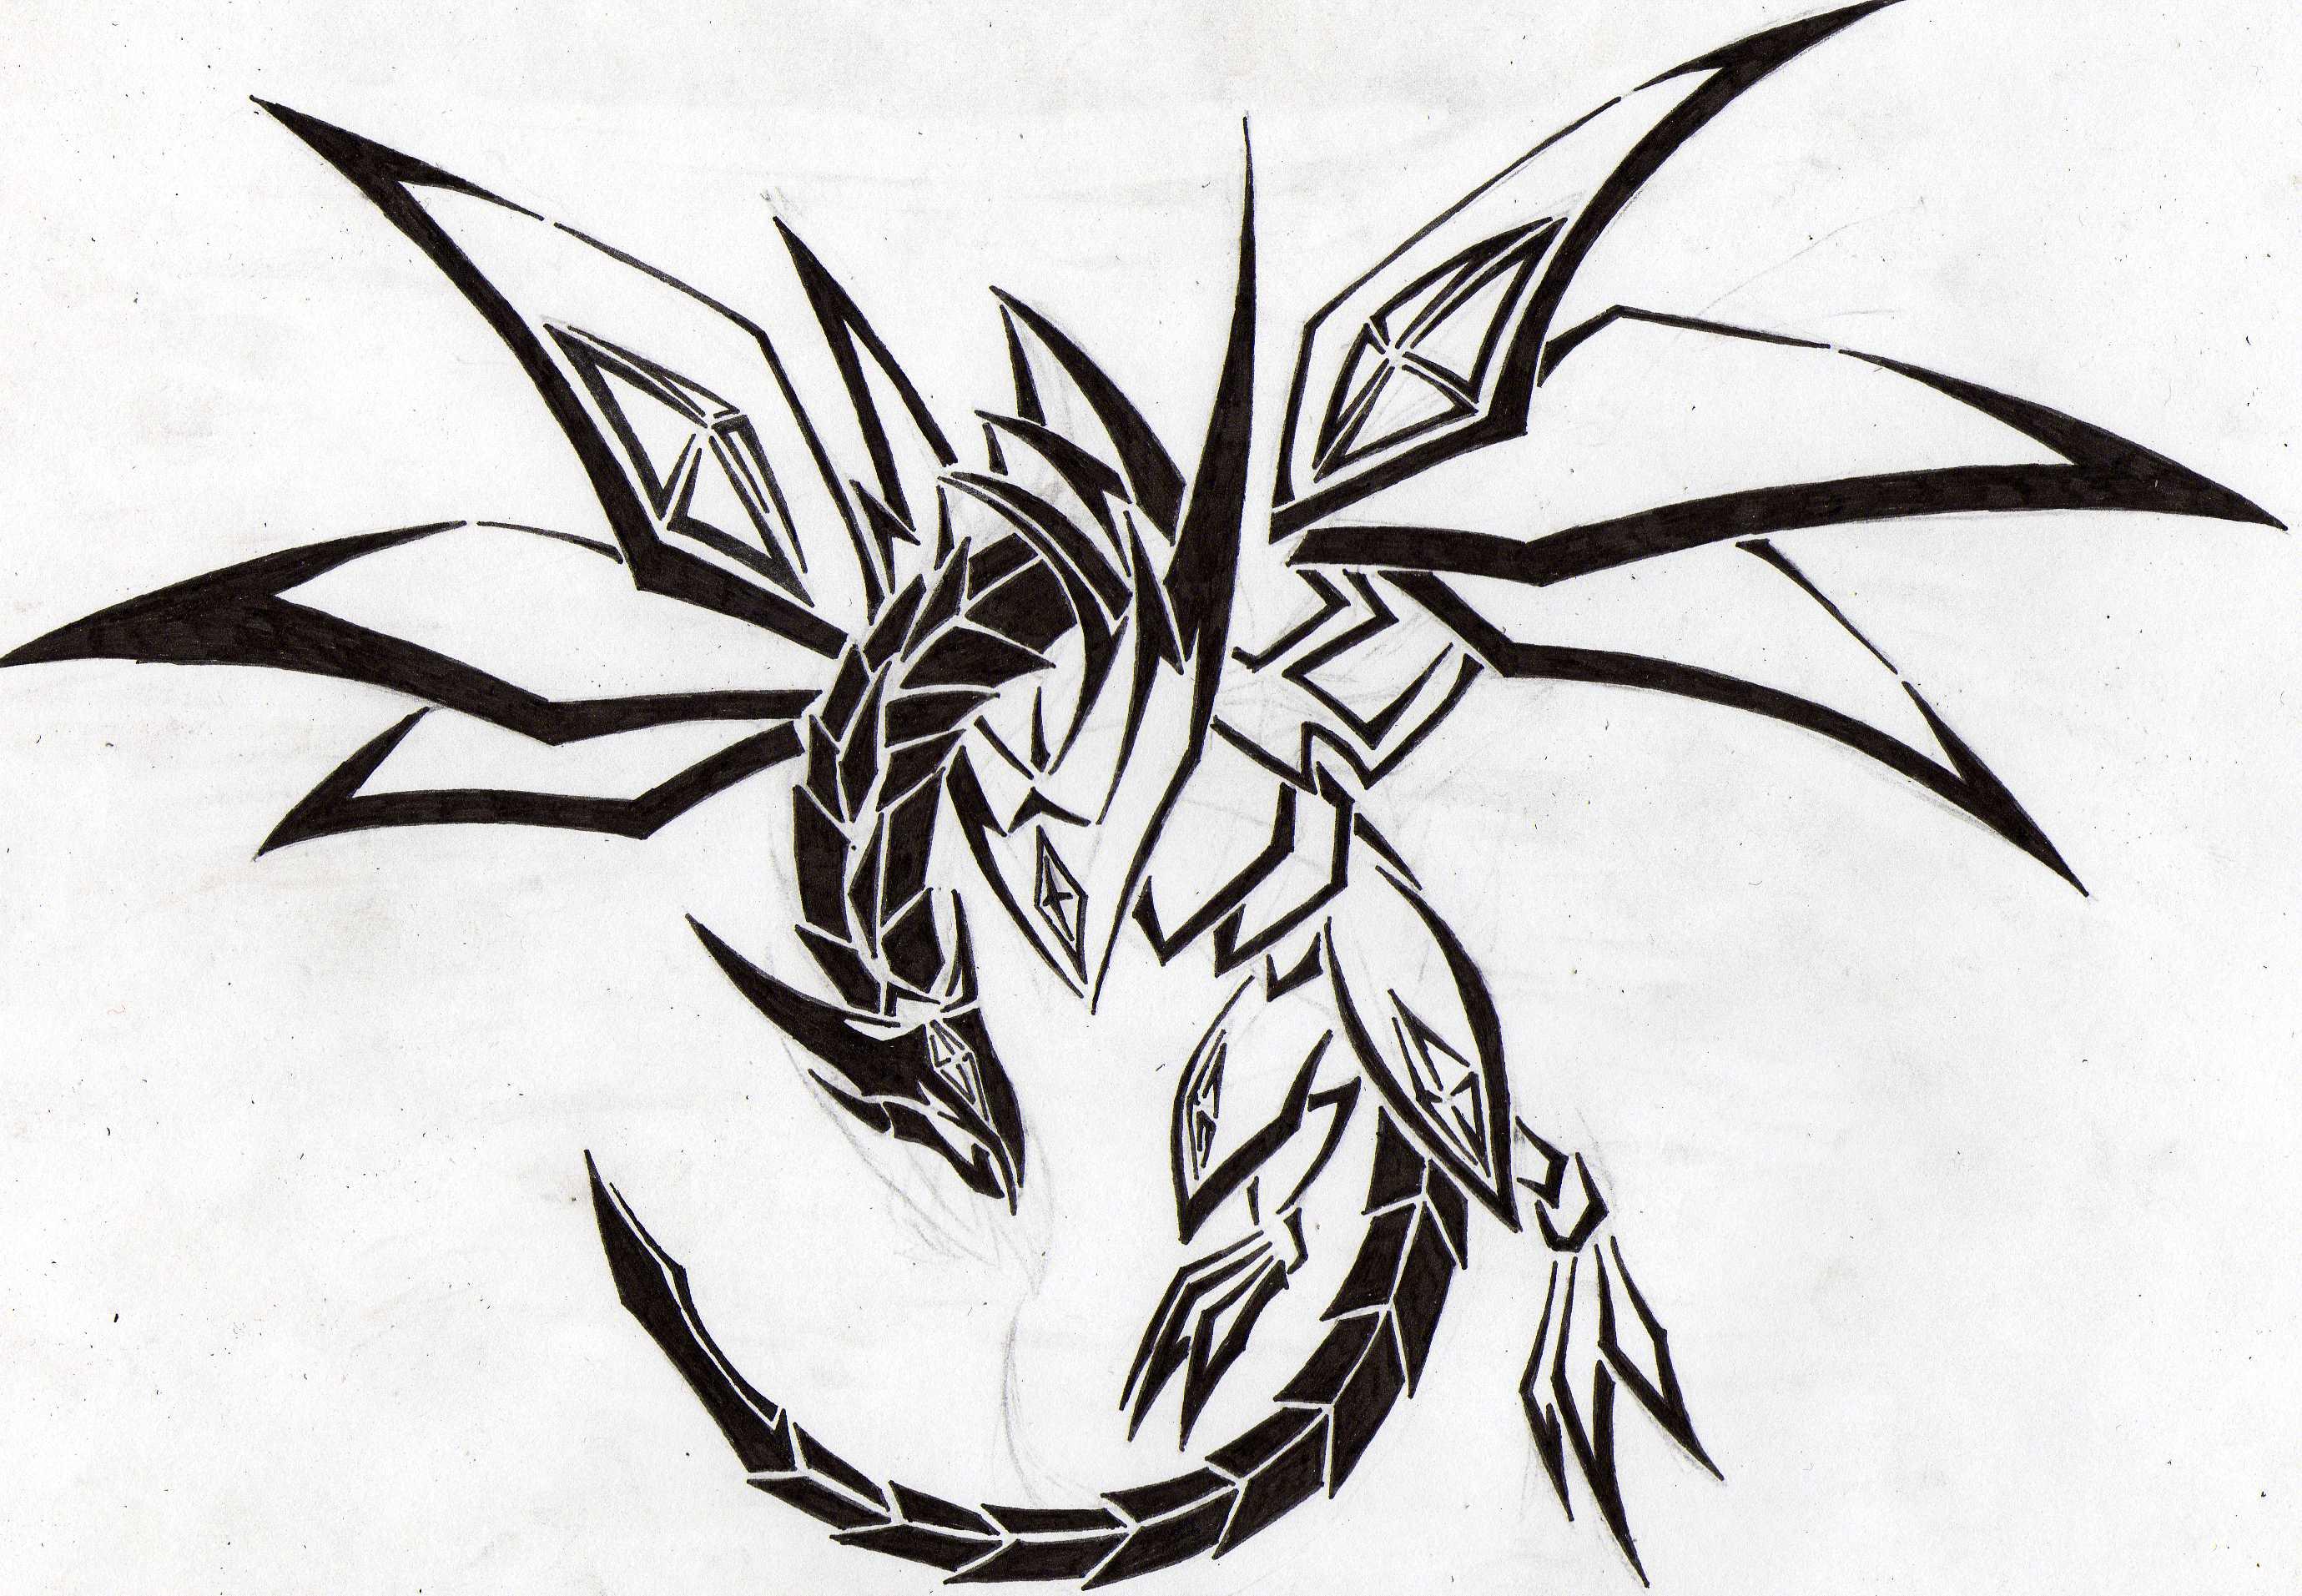 2759x1913 Red Eyes Darkness Dragon Tribal By Aglinskas On DeviantArt